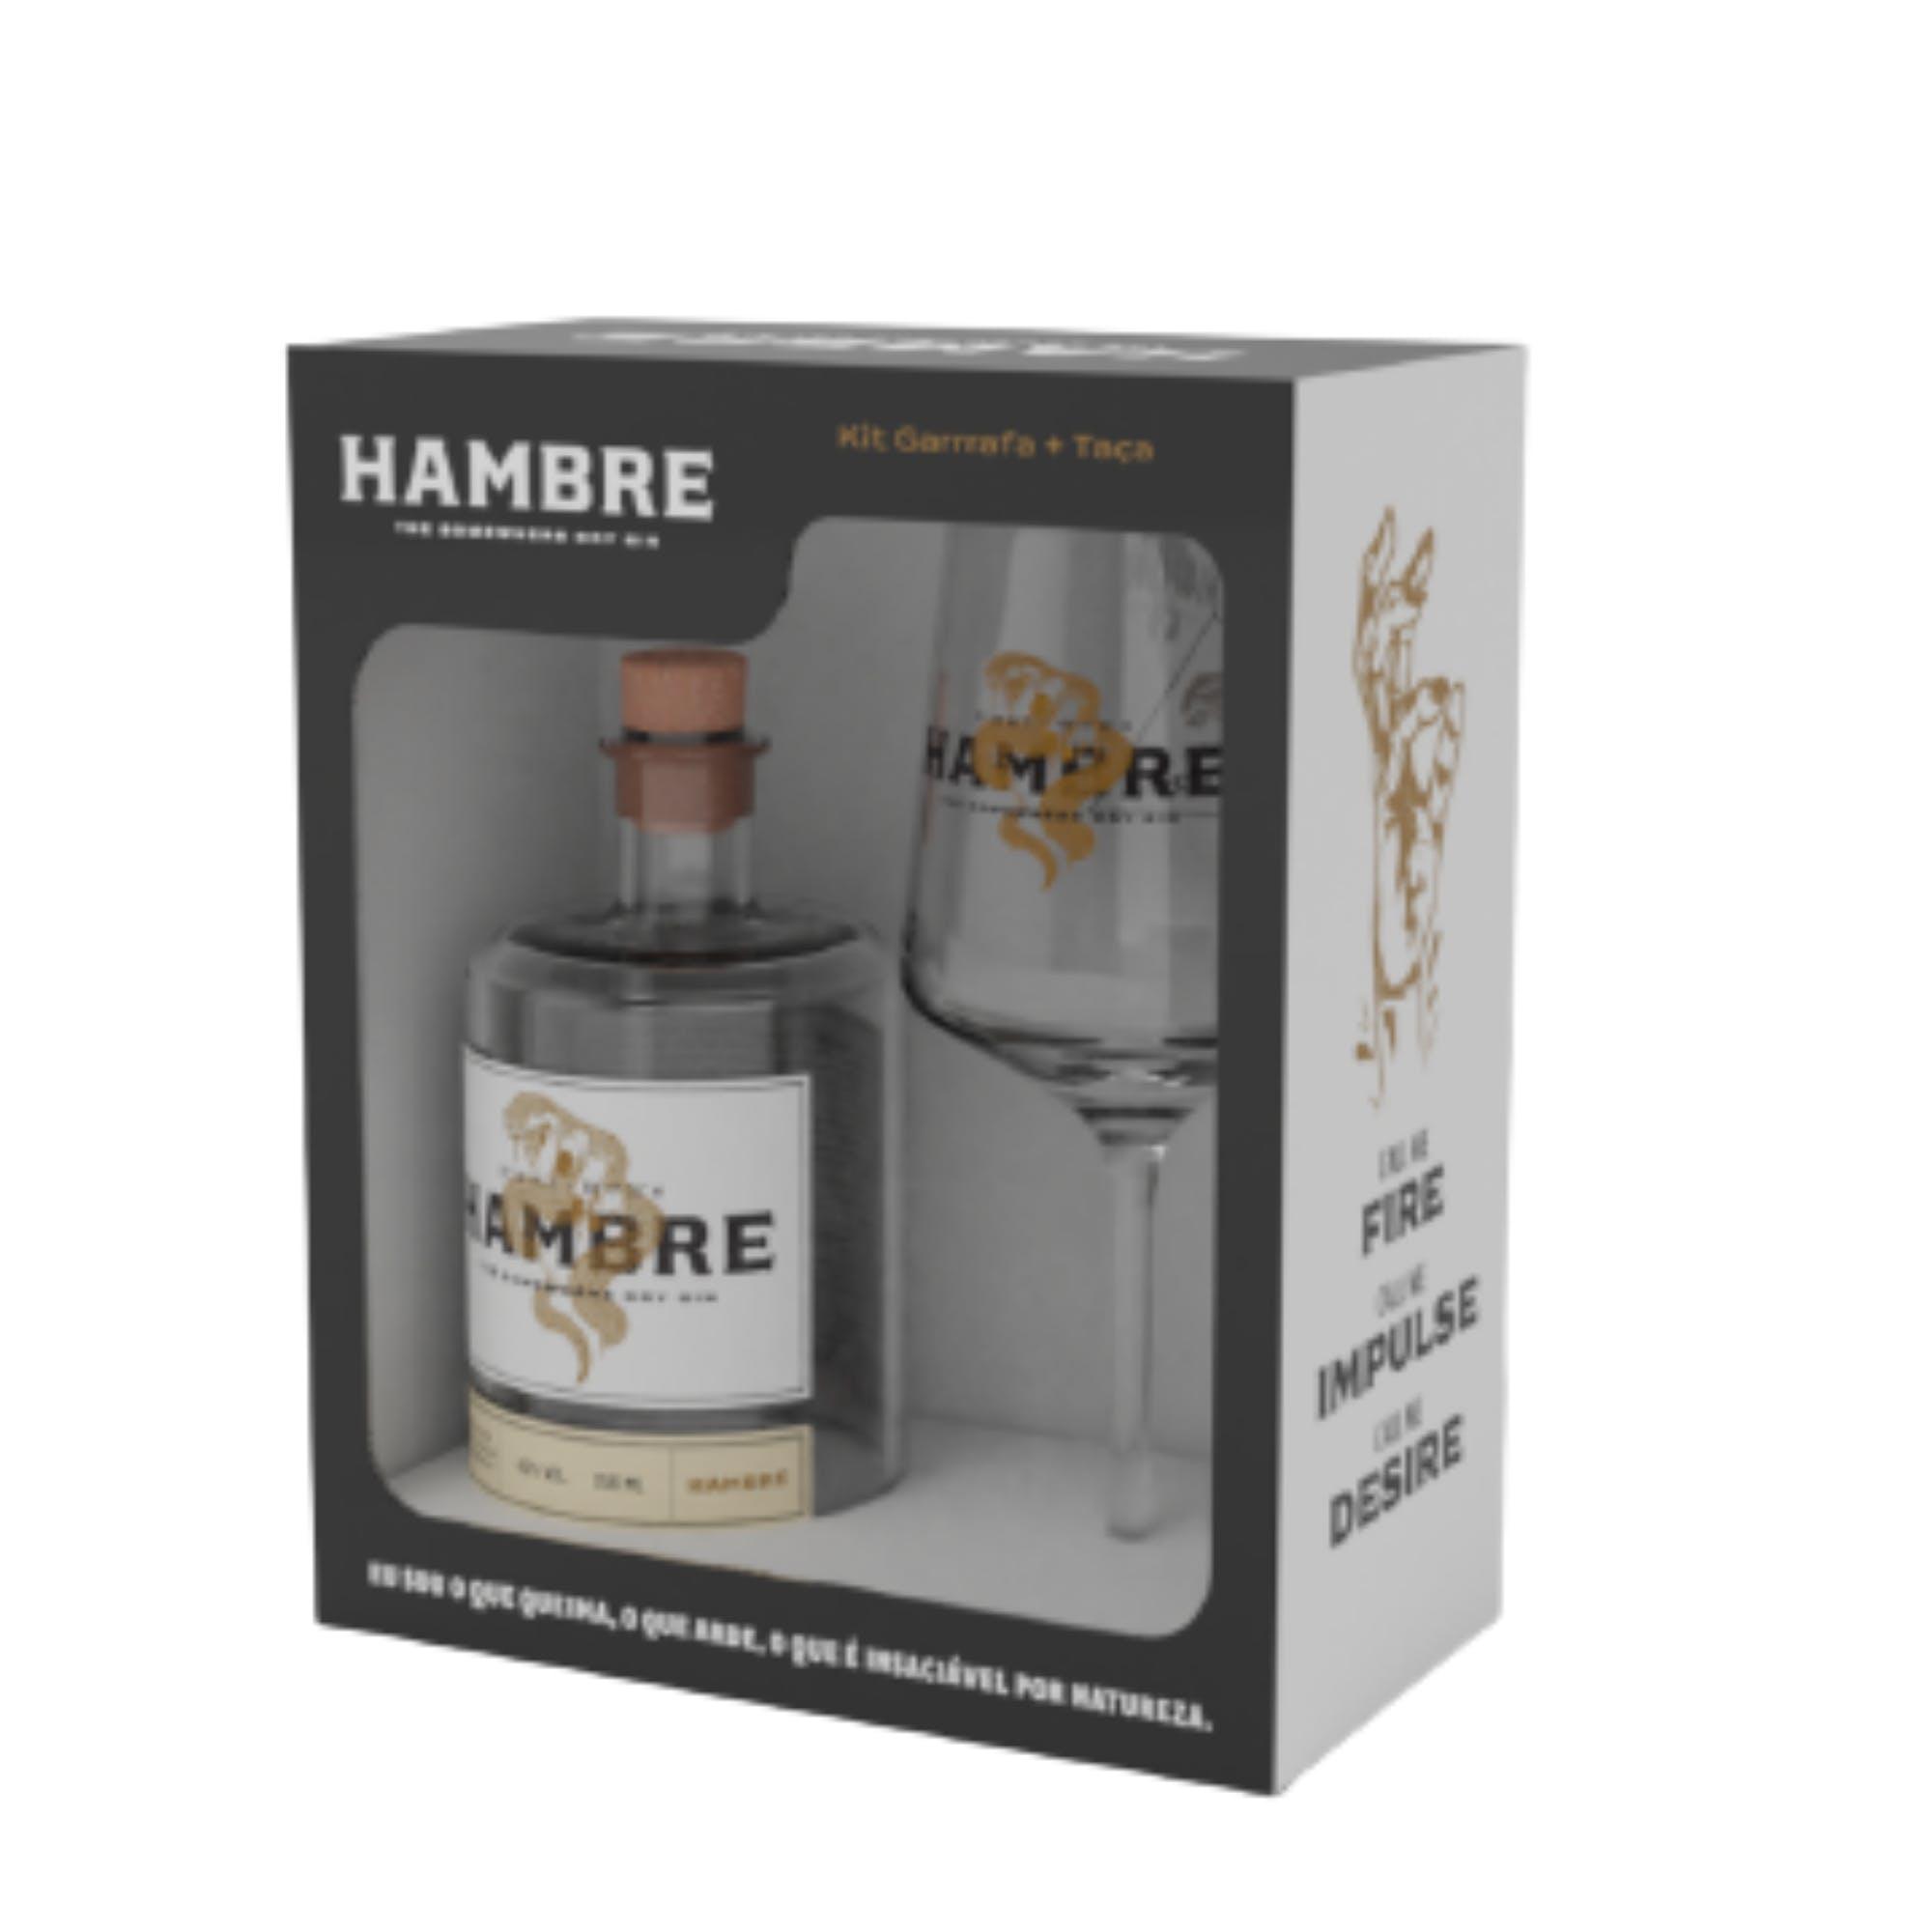 Kit Hambre Gin 750ml + Taça de Vidro 490ml